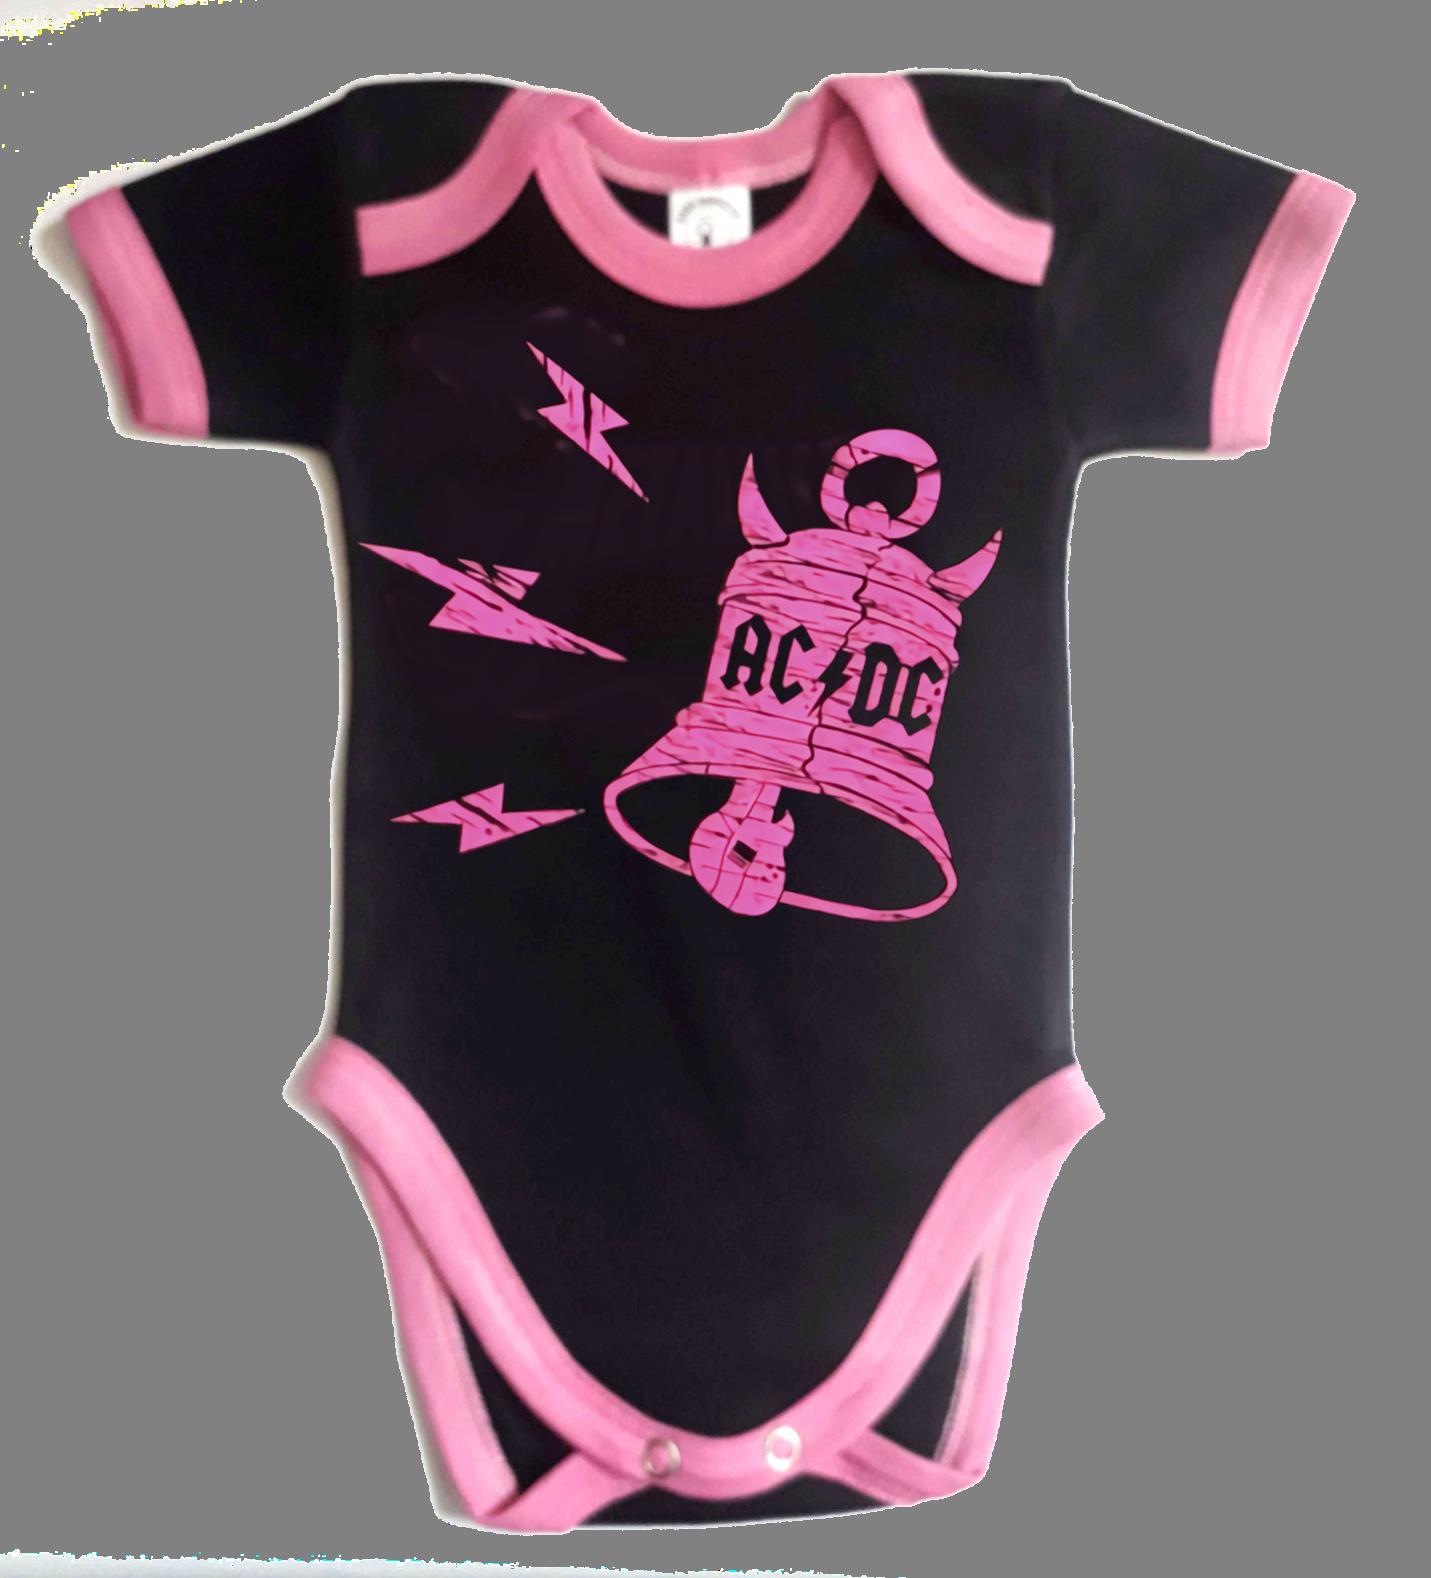 Ropa Bebe Body Bodi rock AC/DC bells  Baby Monster